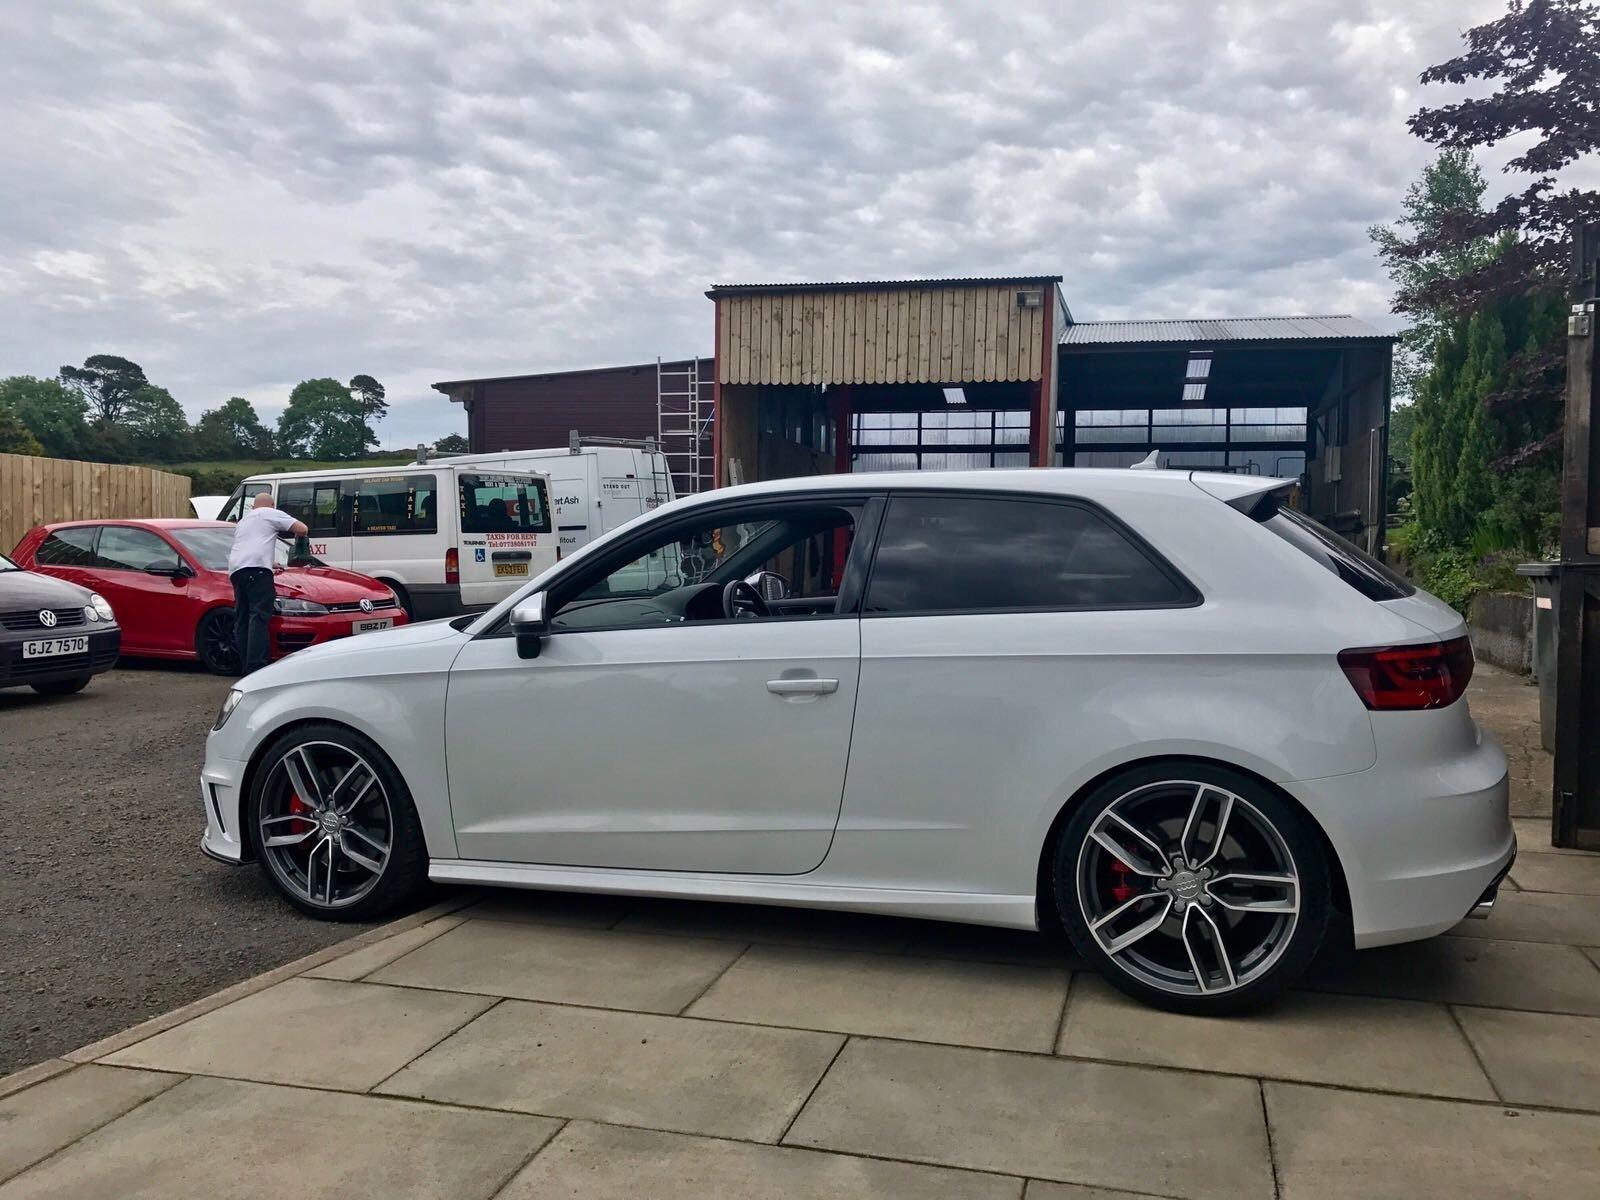 Image Result For Audi A Sportback Lowering Springs